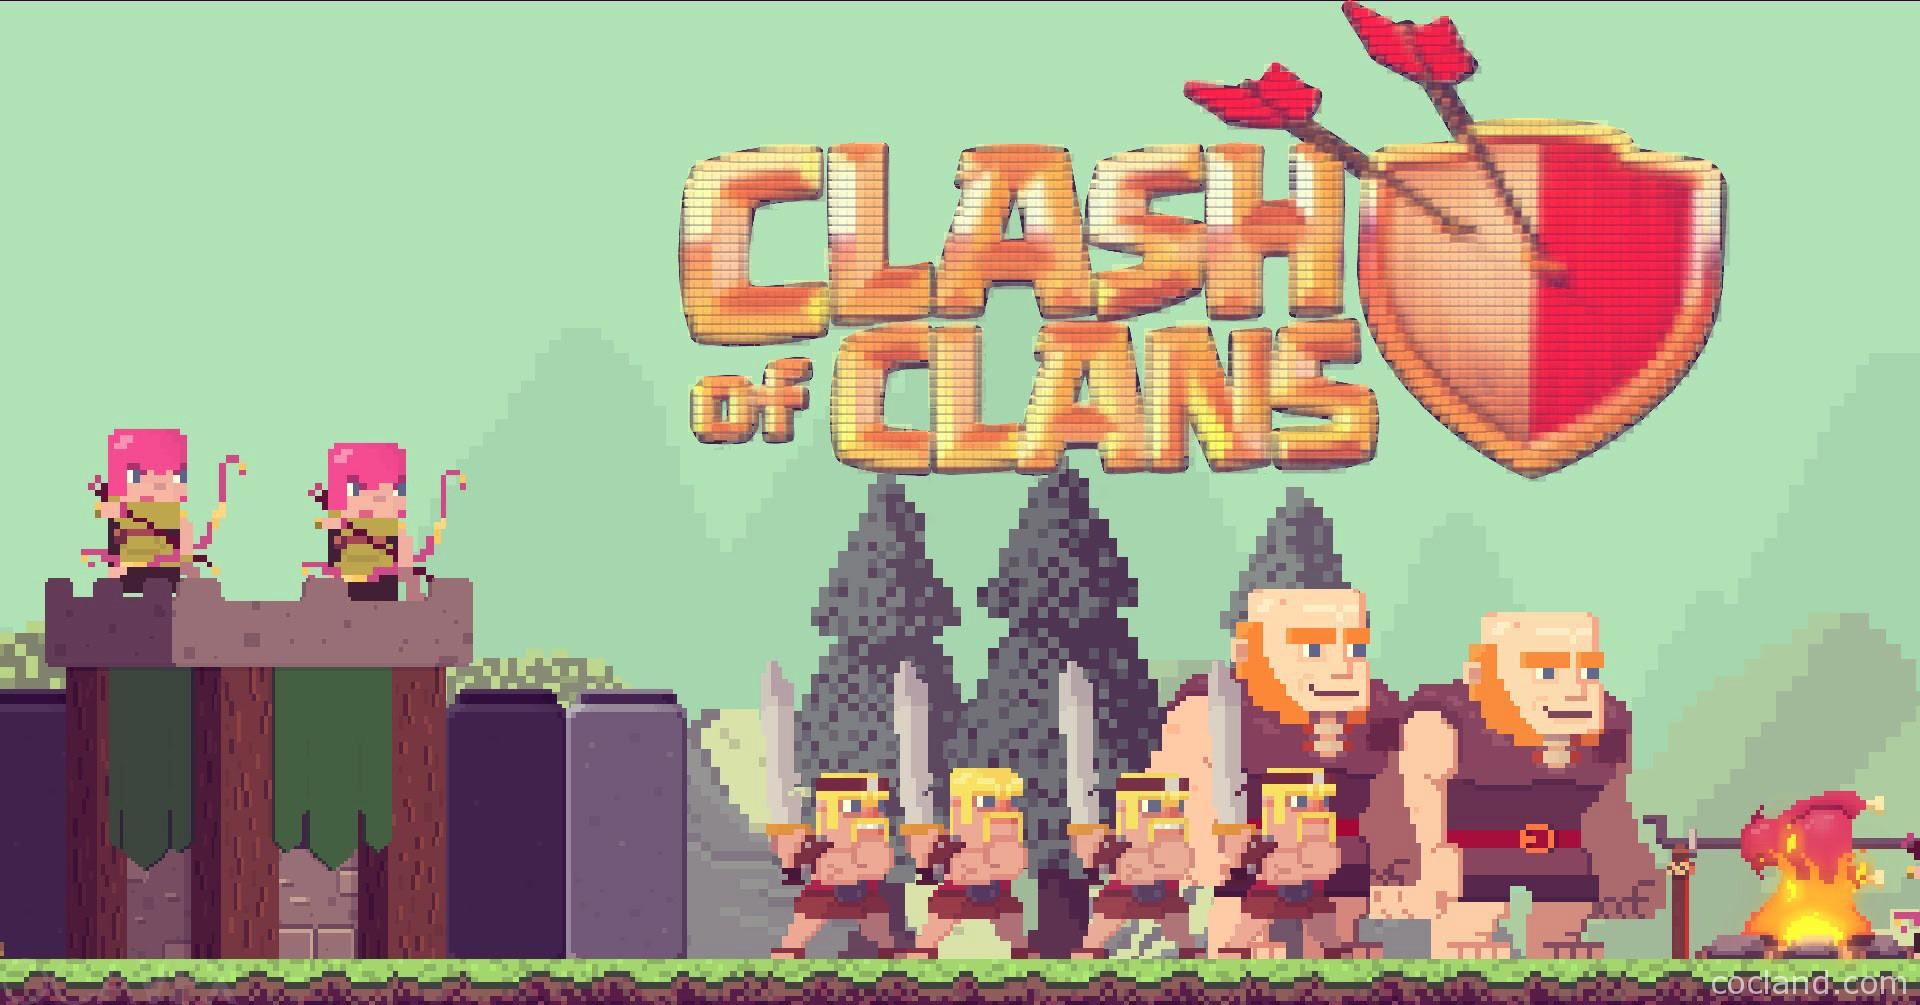 Best Clash of Clans videos